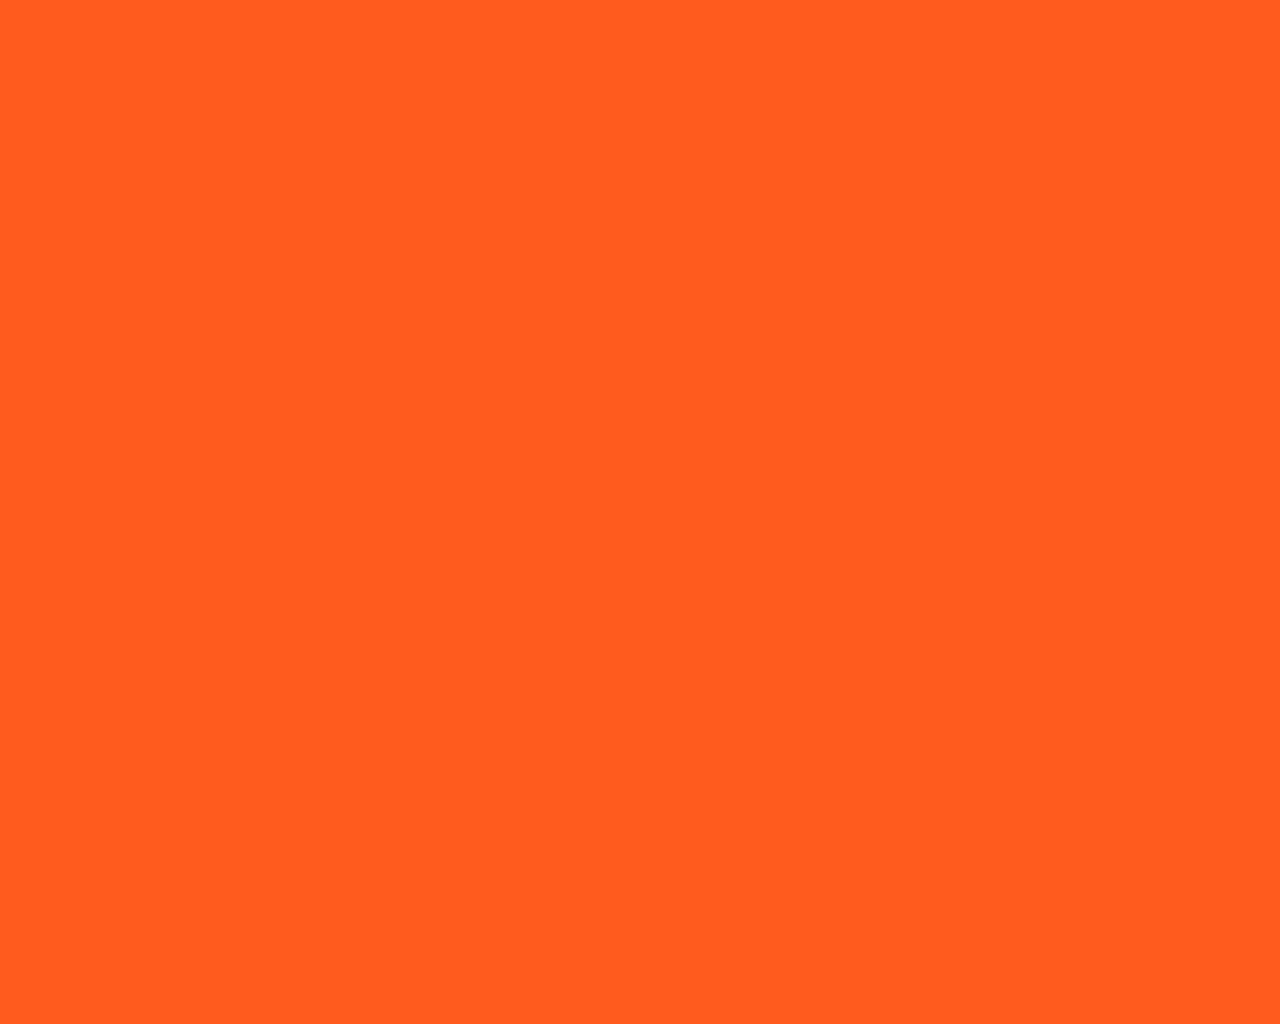 1280x1024 Giants Orange Solid Color Background